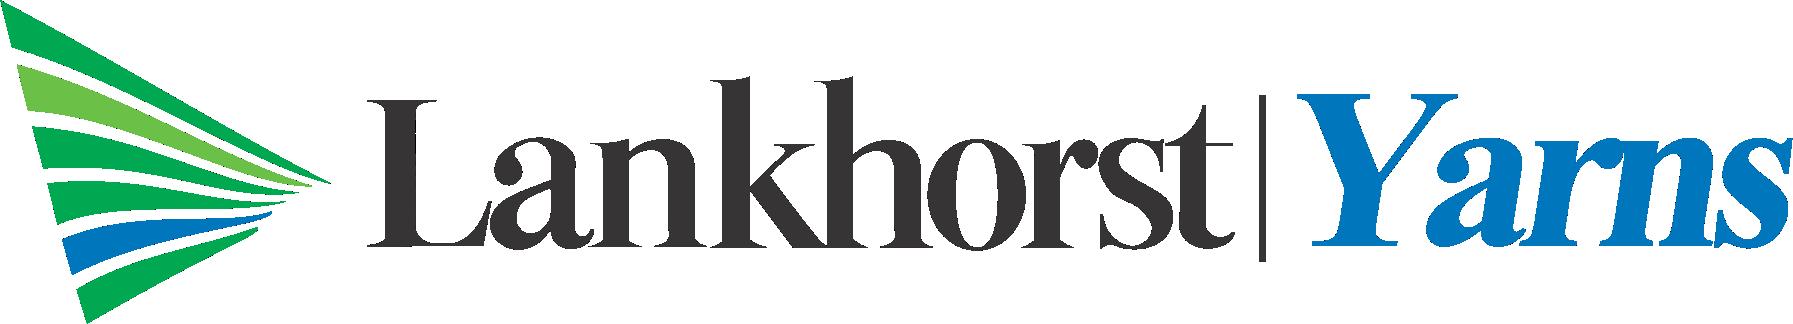 lankhorst